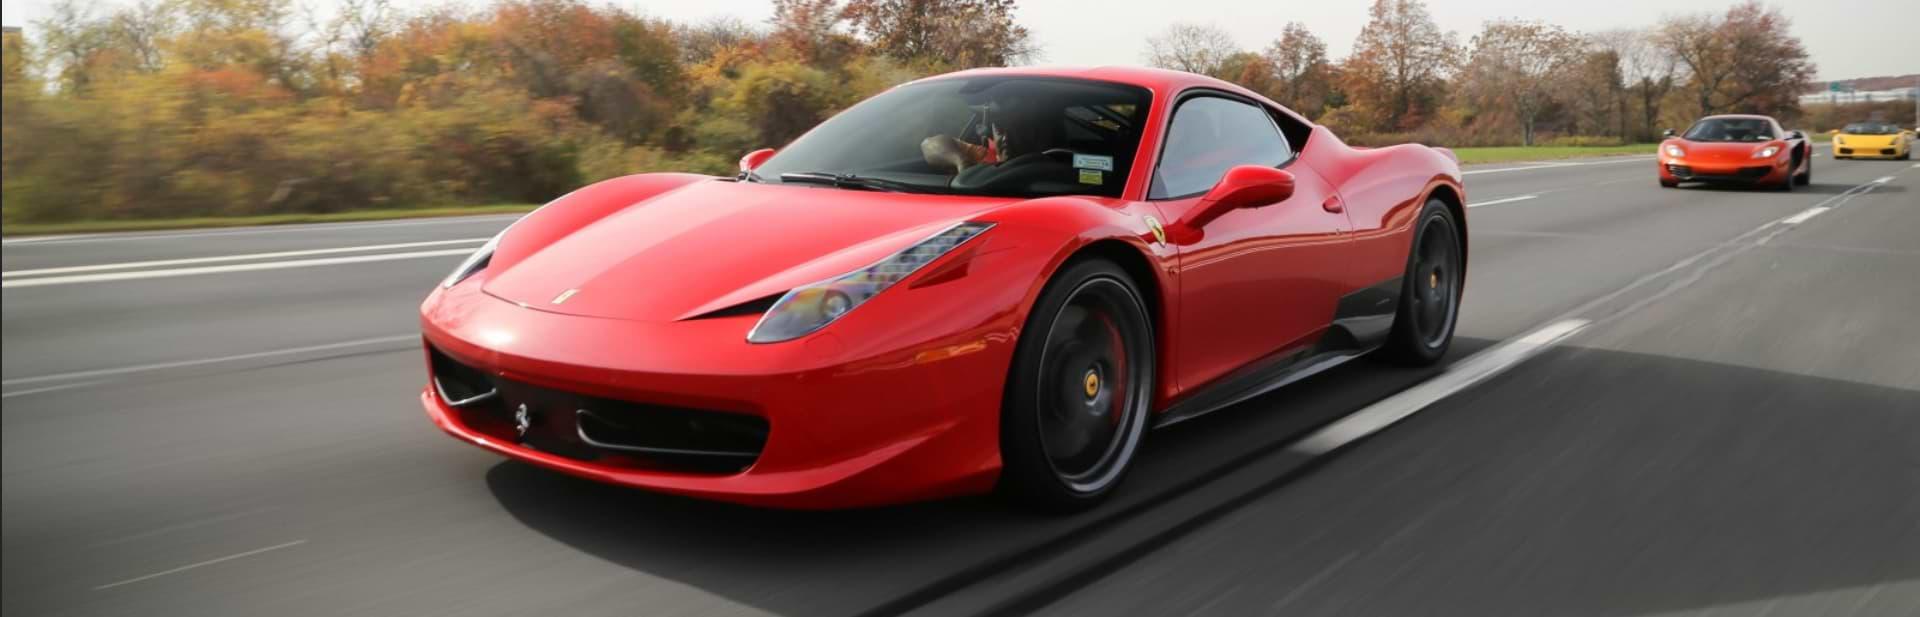 Ferrari Repair & Service